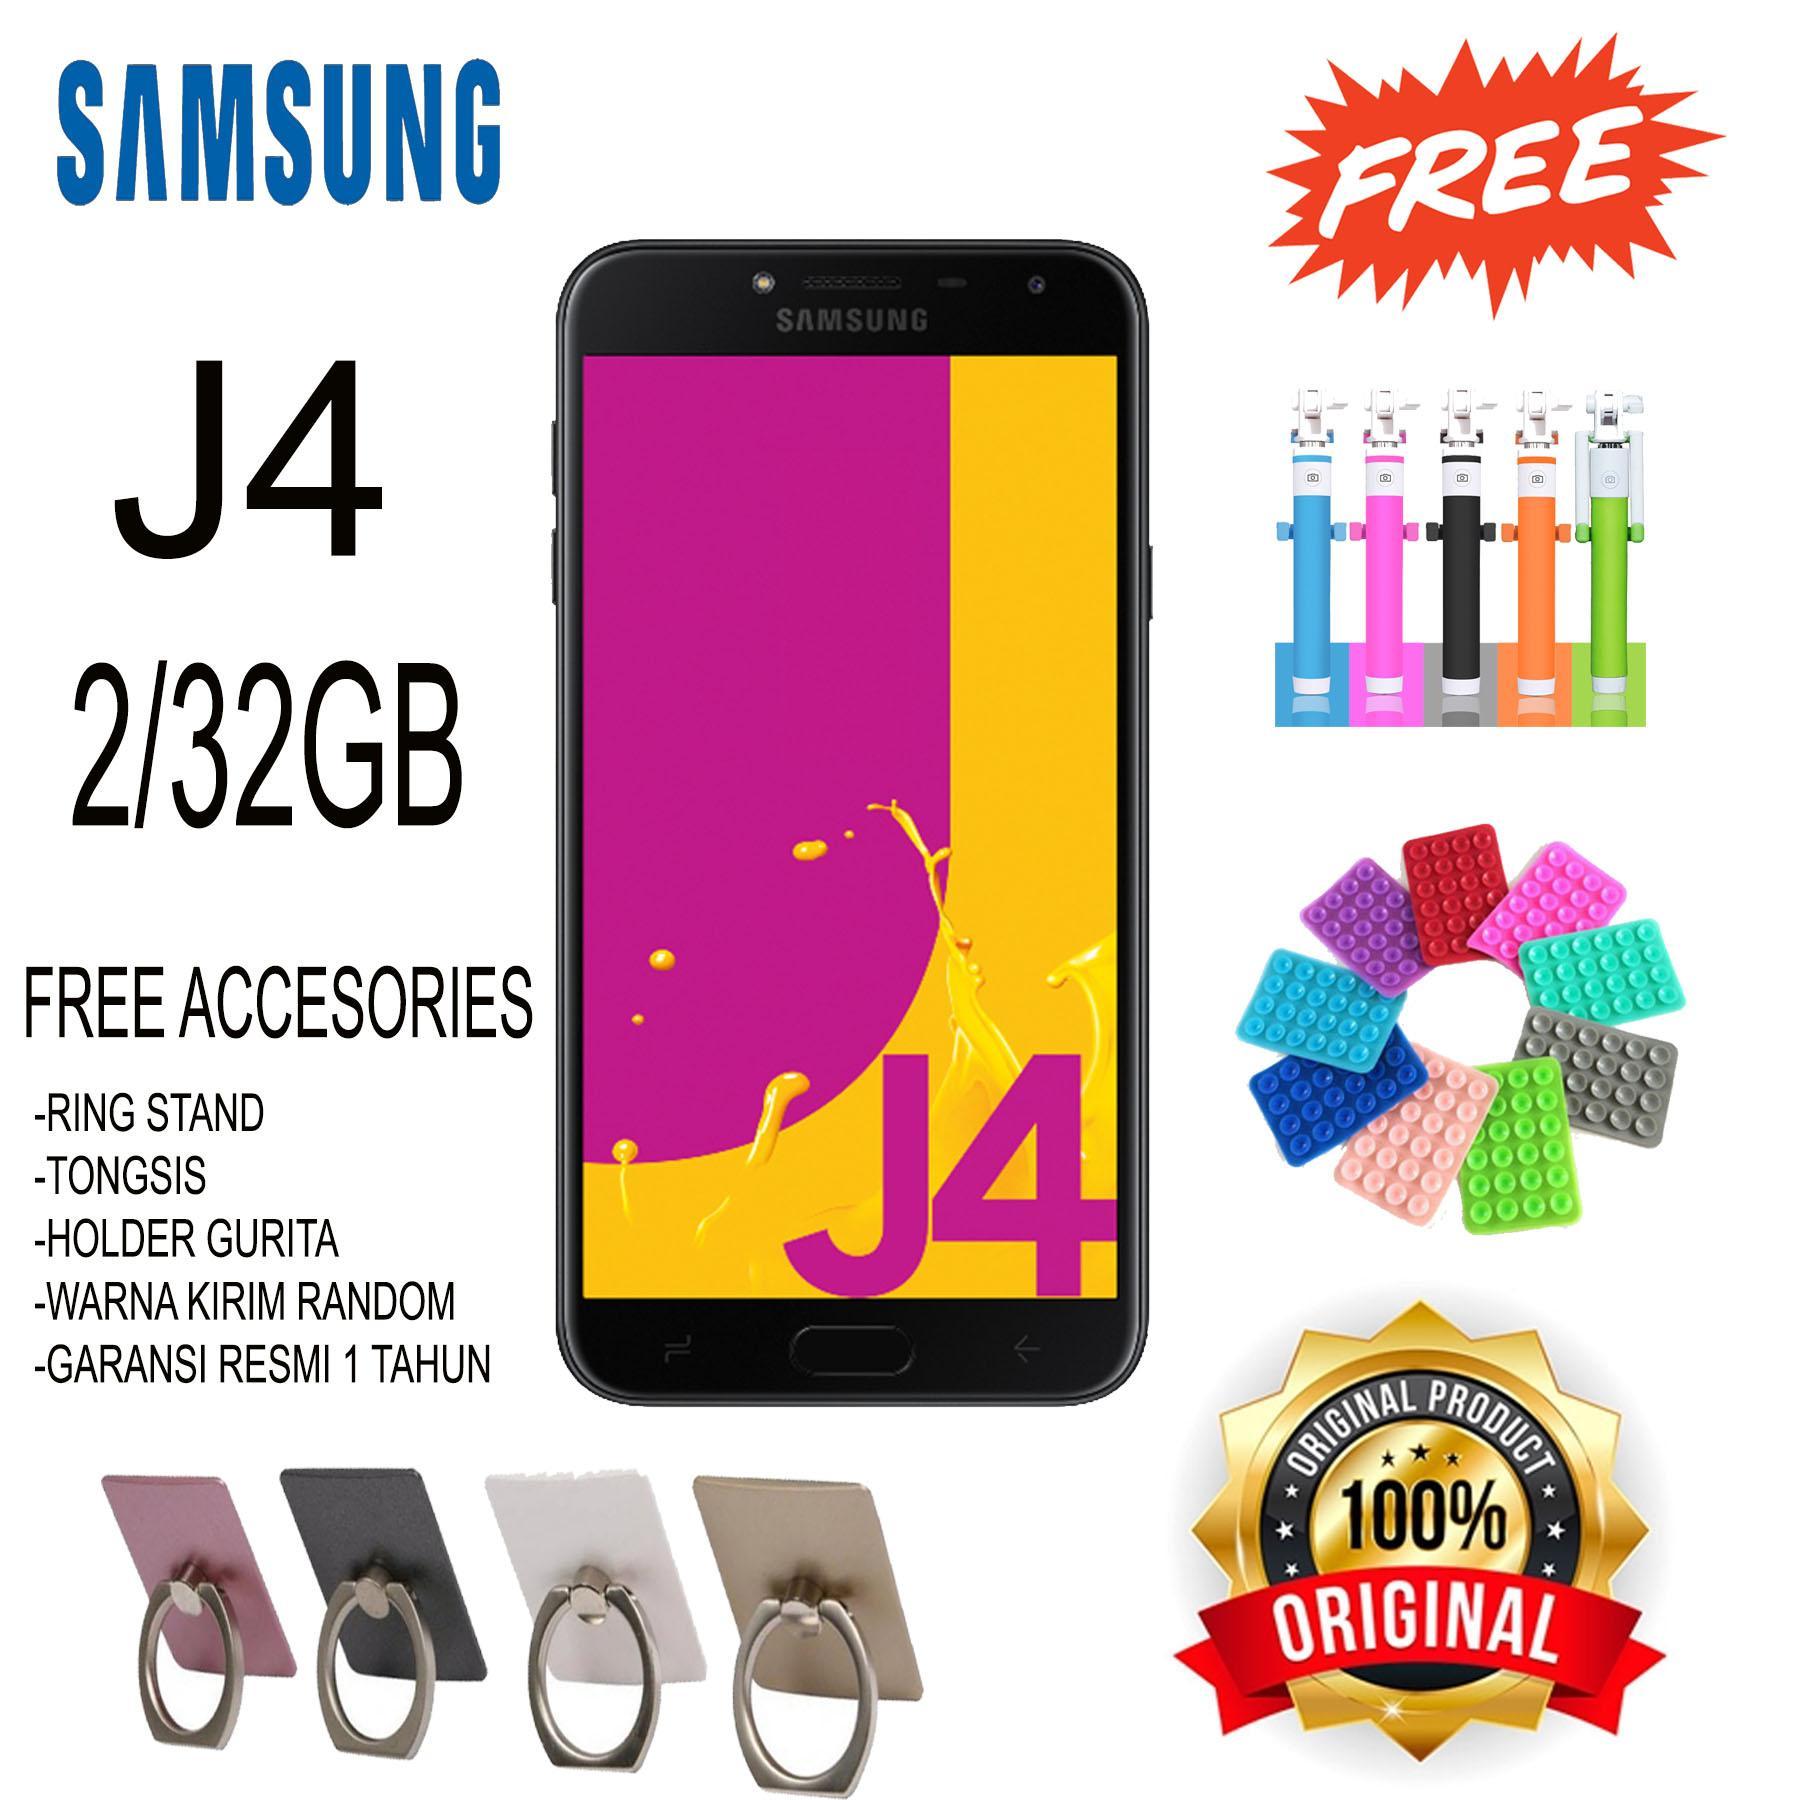 Harga Samsung Galaxy V2 J106b Smartphone Garansi Resmi Lengkap S6 32gb J4 2gb Free Accesories